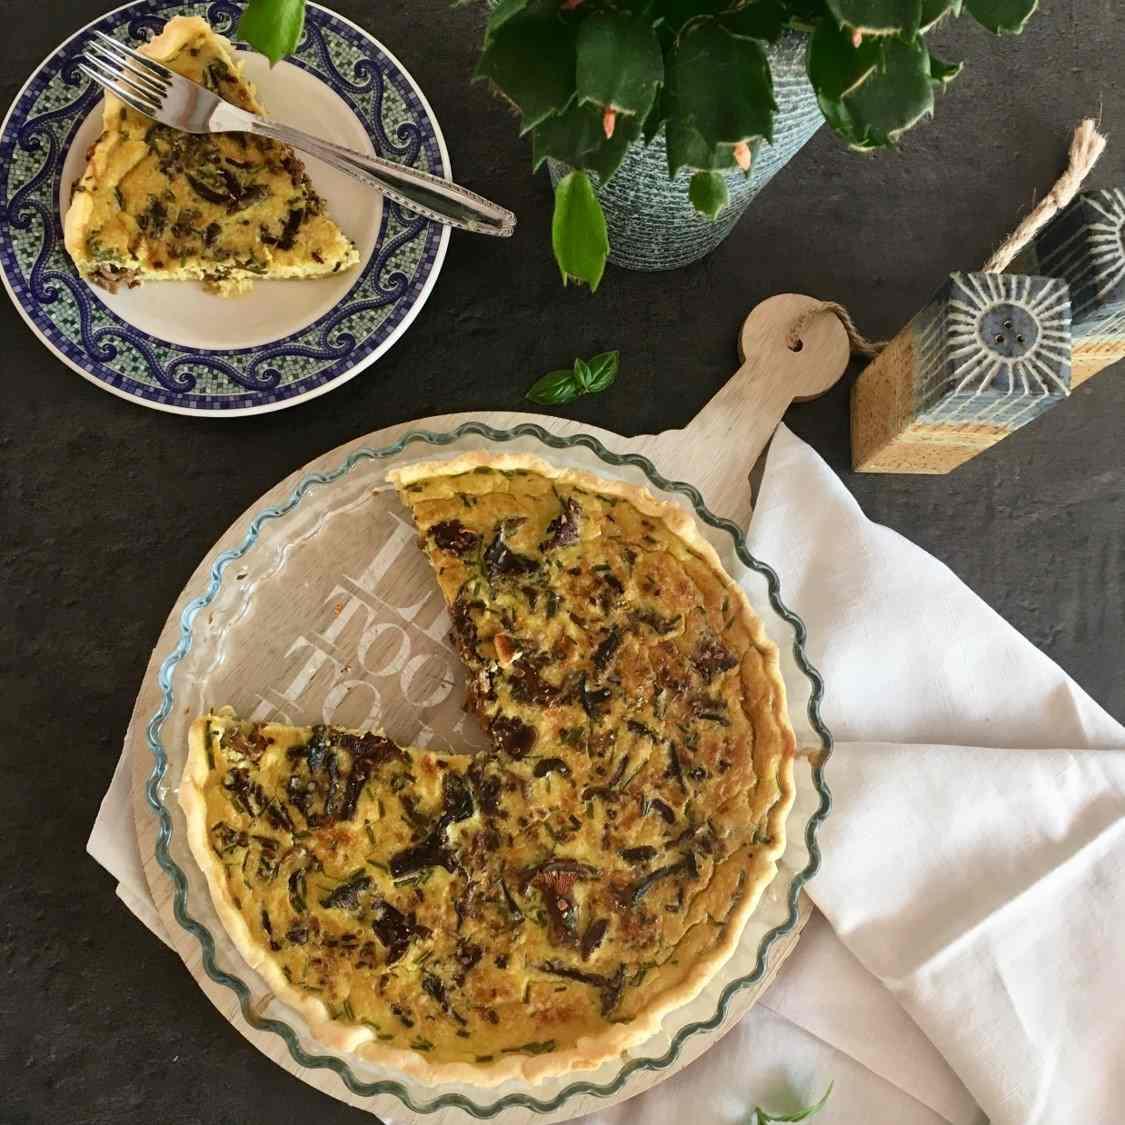 tarte-girolle-poireau-carres-futes-recette